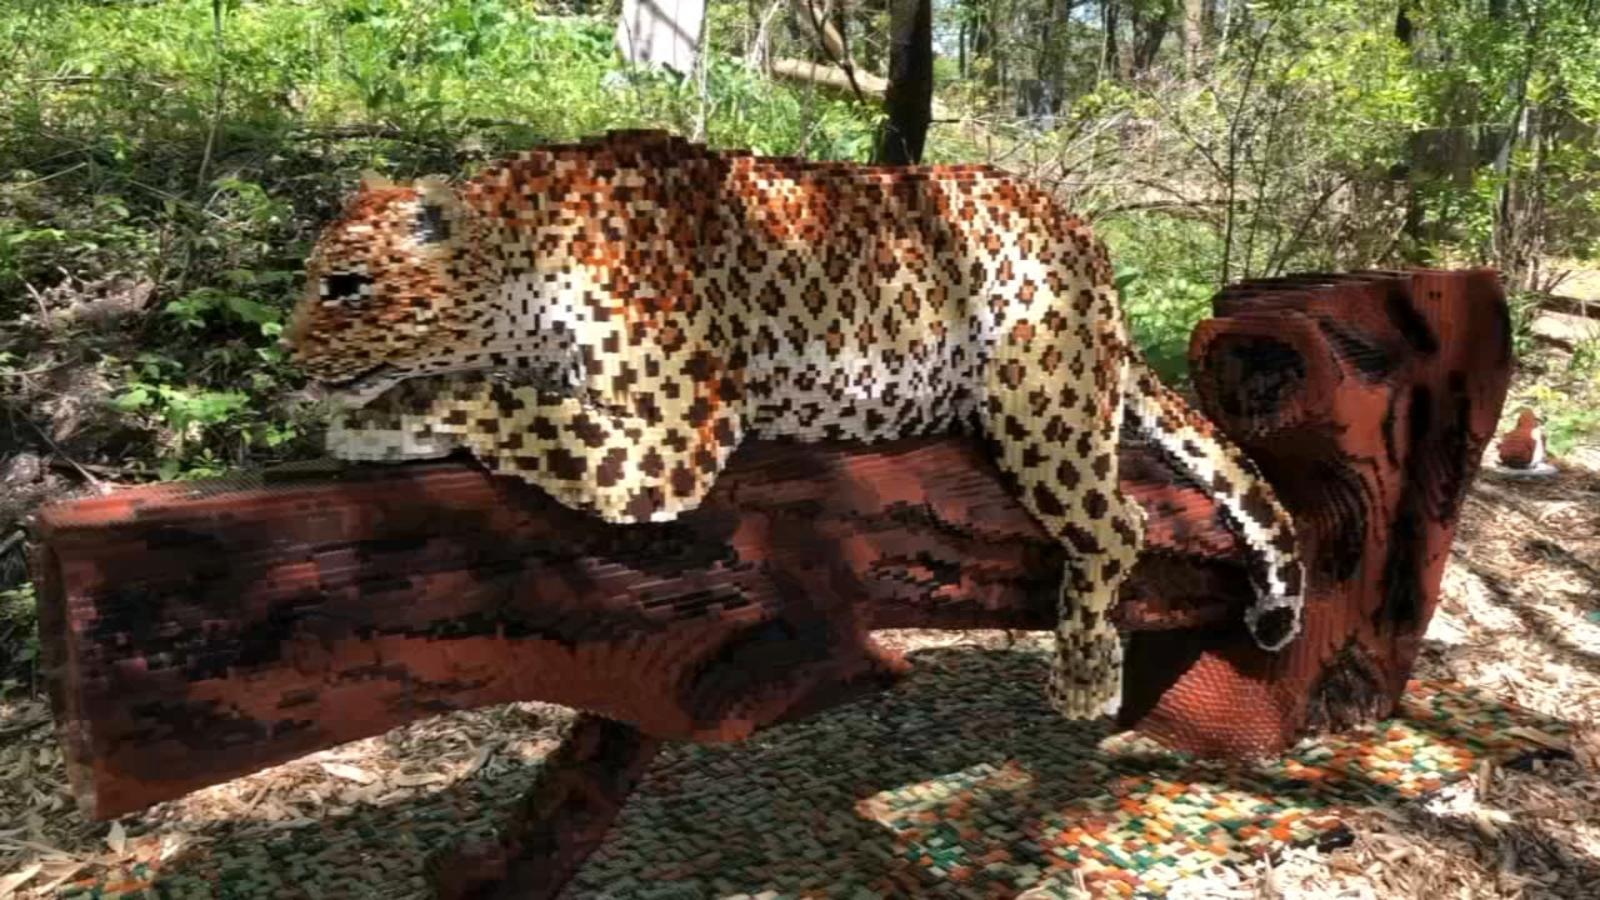 Brookfield Zoo's 'Brick Safari' features life-sized ...